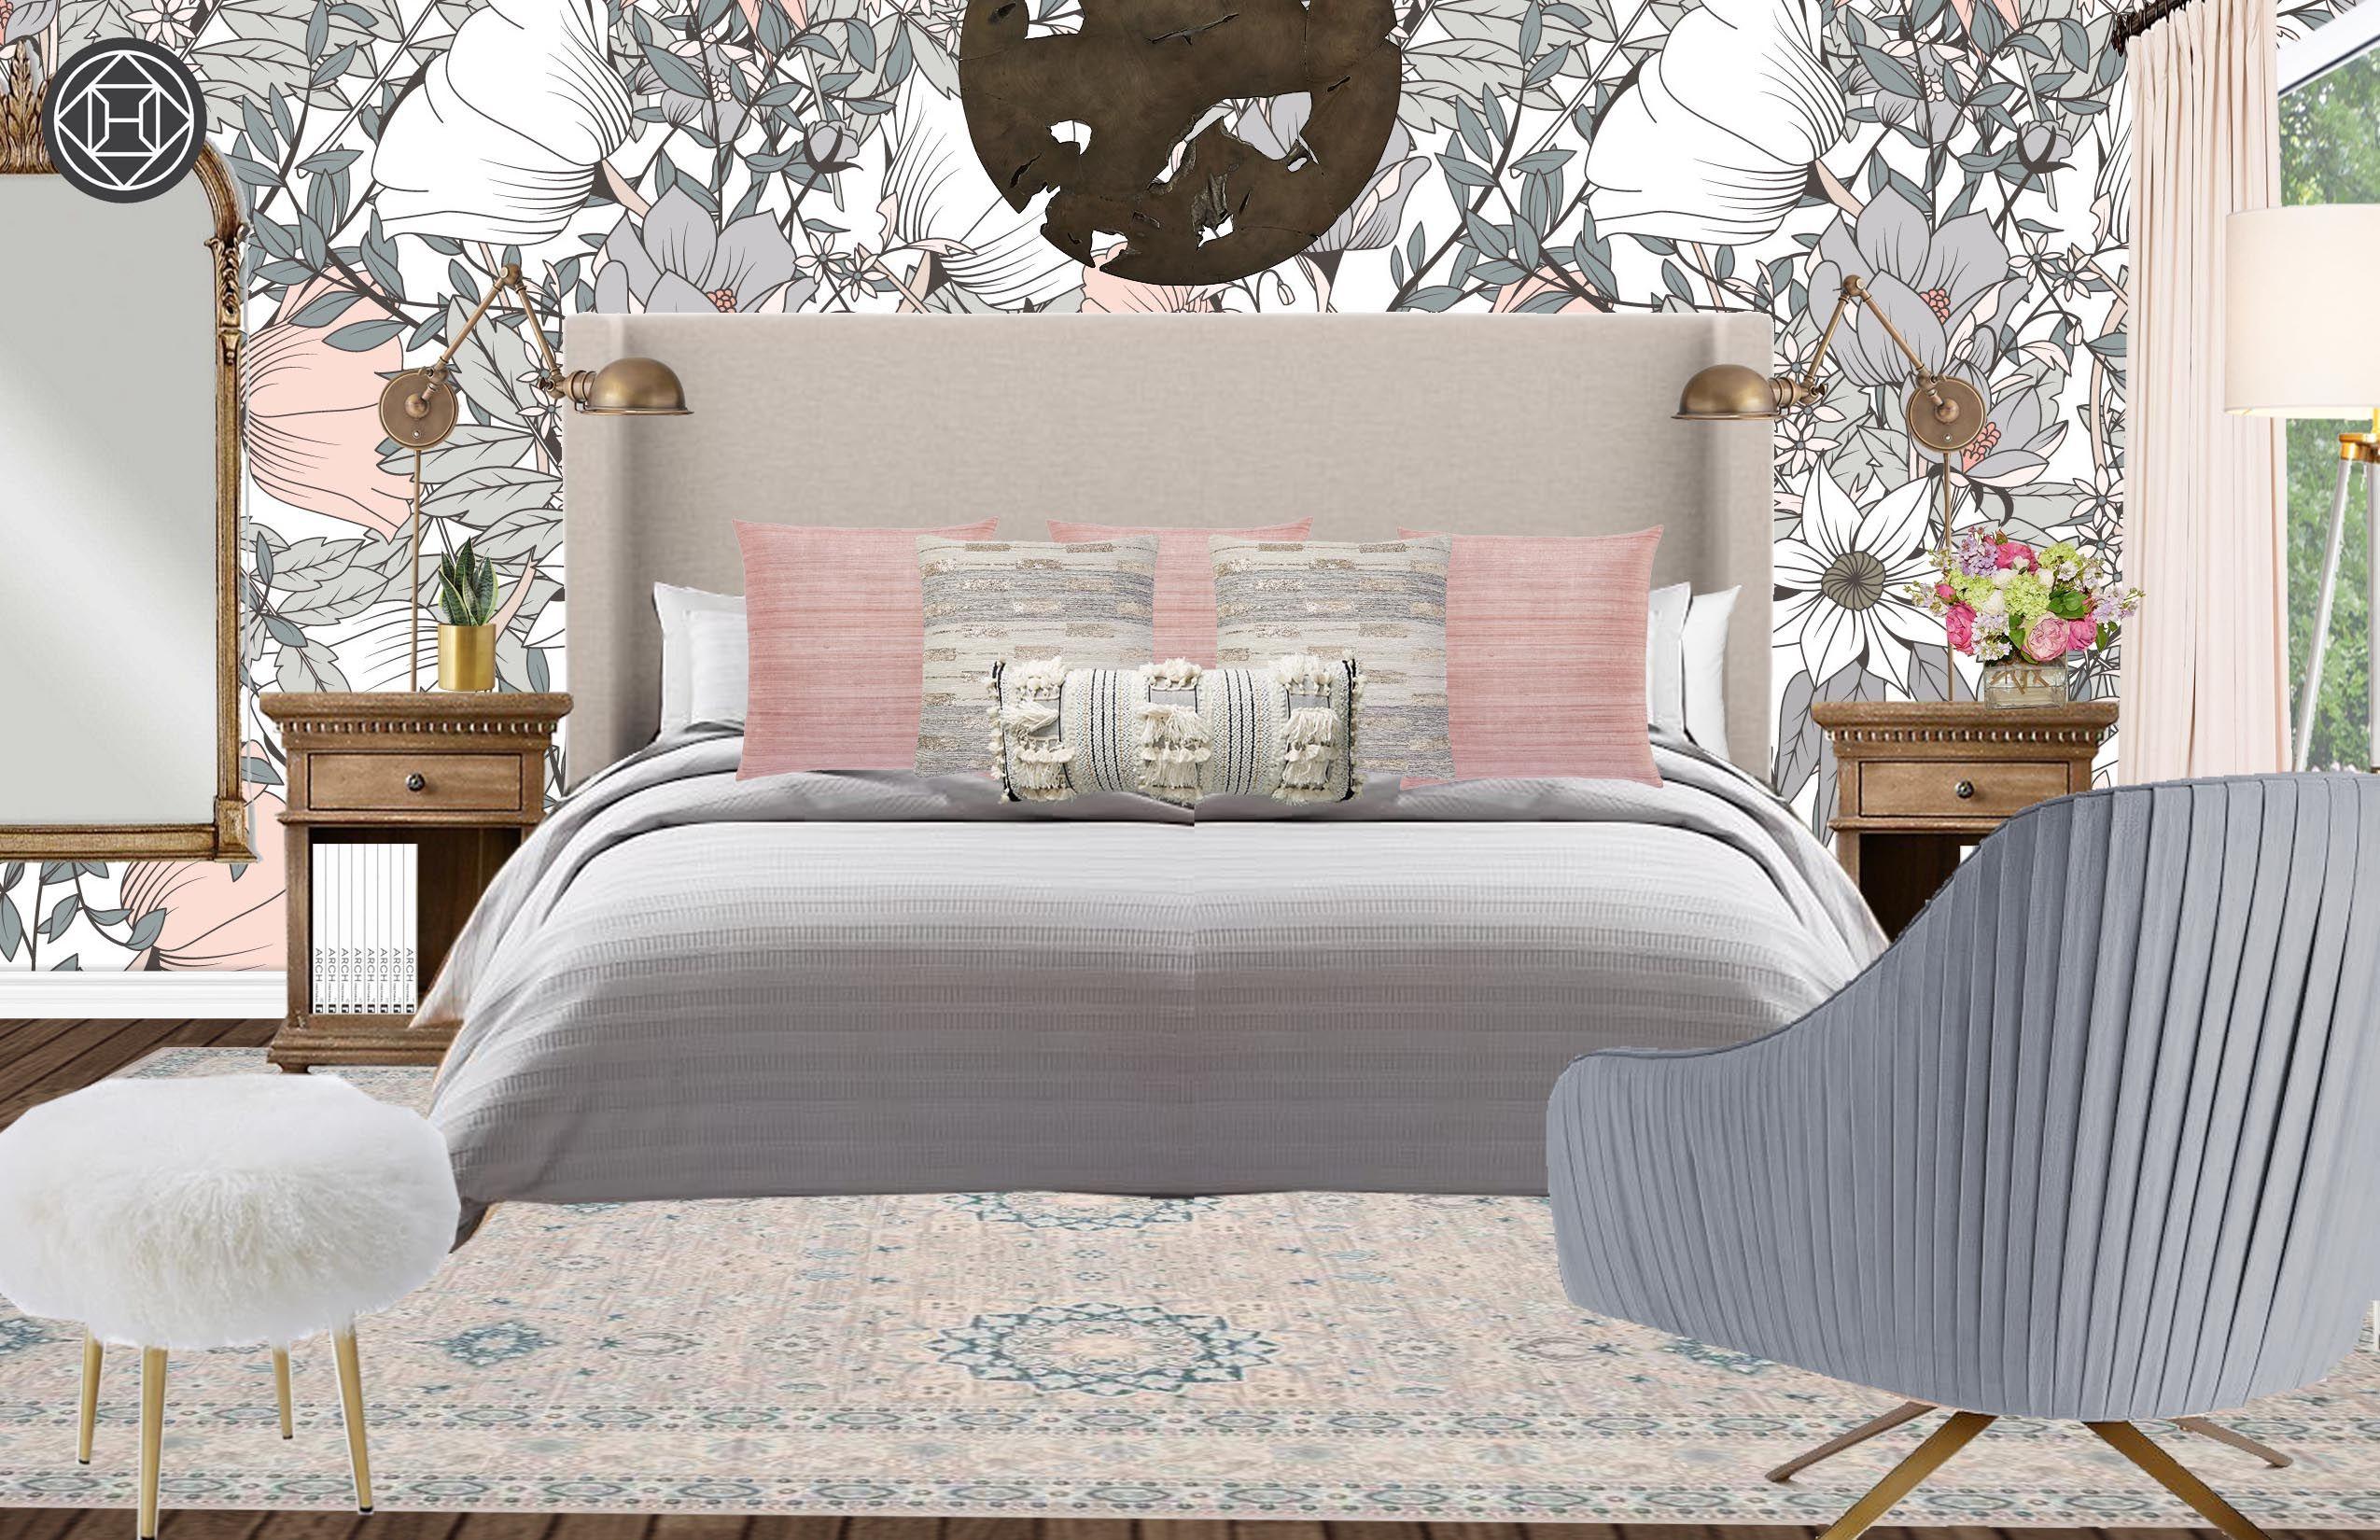 Best Eclectic Bohemian Glam Midcentury Modern Bedroom Design 400 x 300